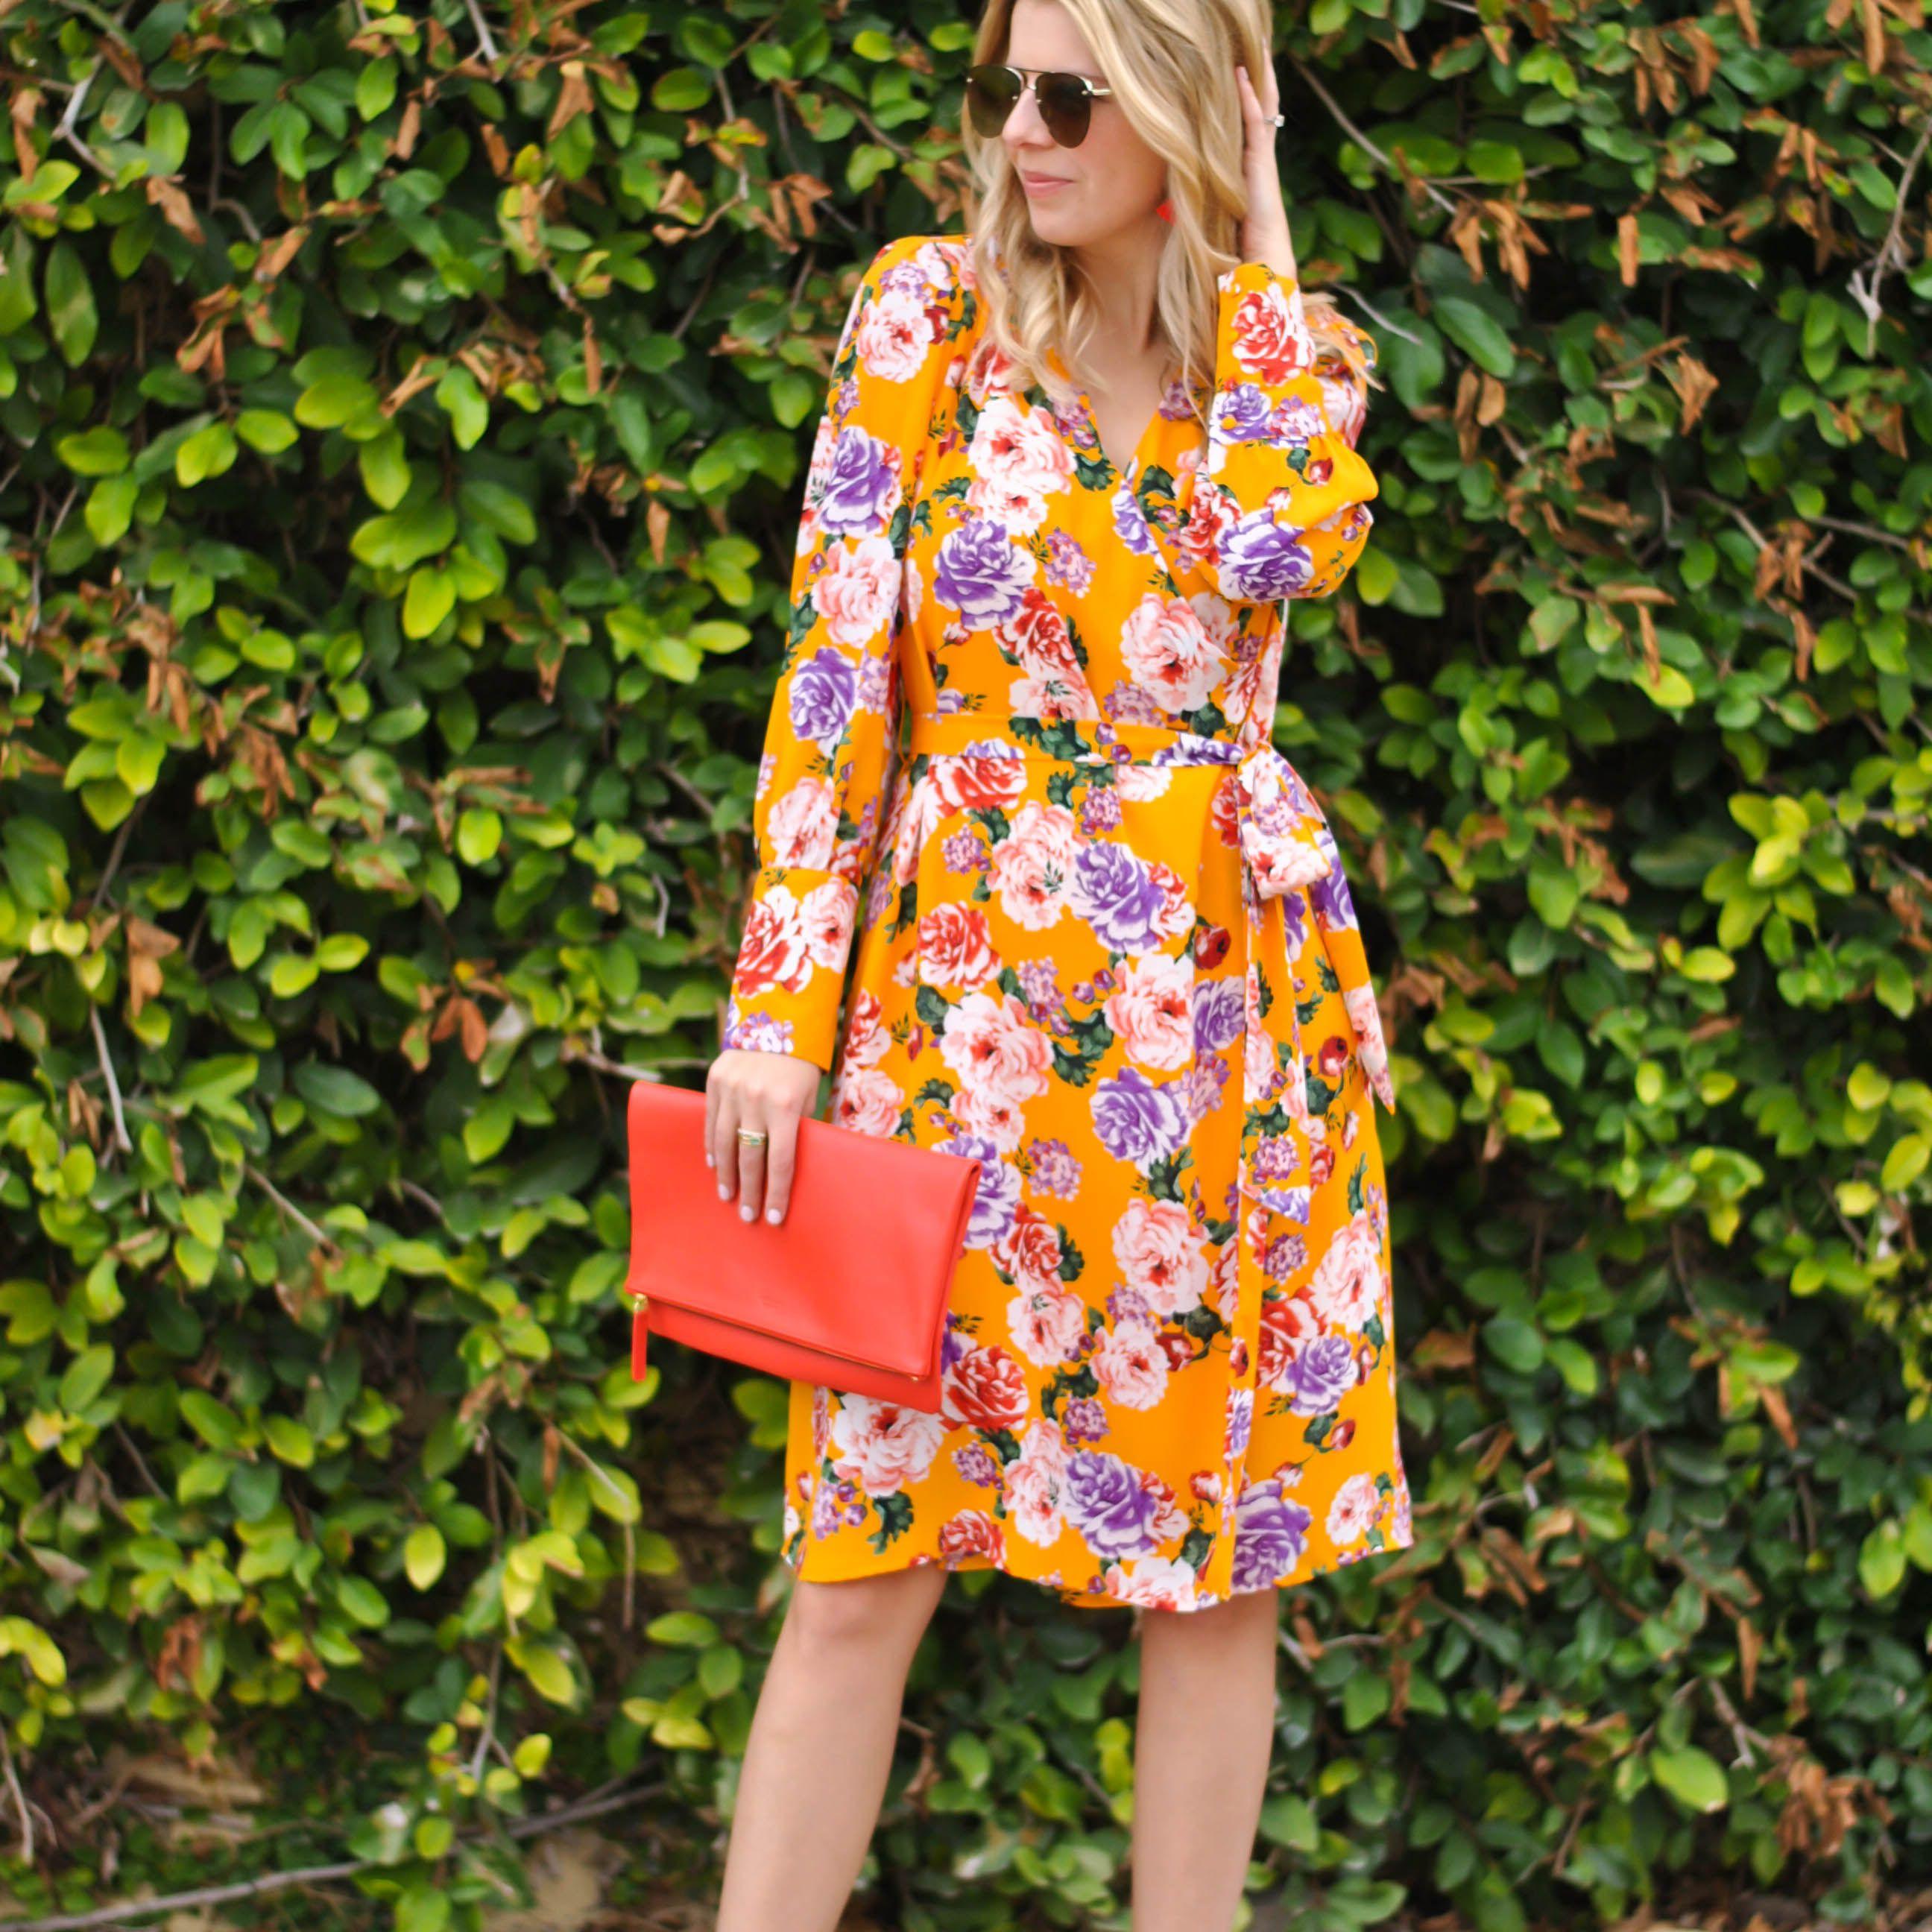 Woman in orange floral print dress